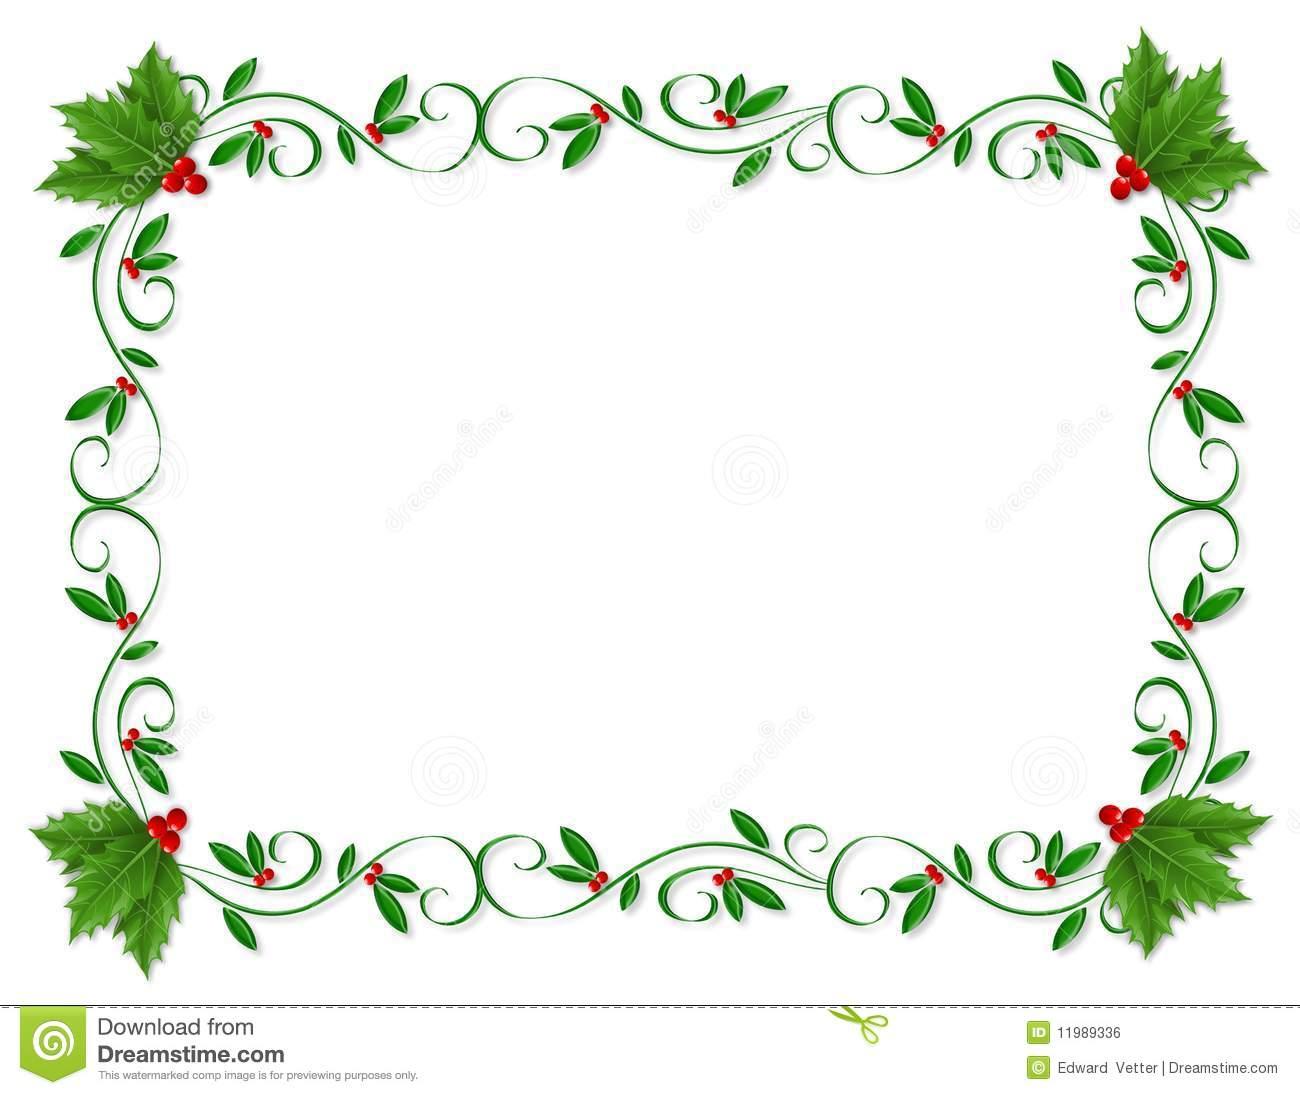 Christmas Letter Border Template - Christmas Borders for Powerpoint Acurnamedia